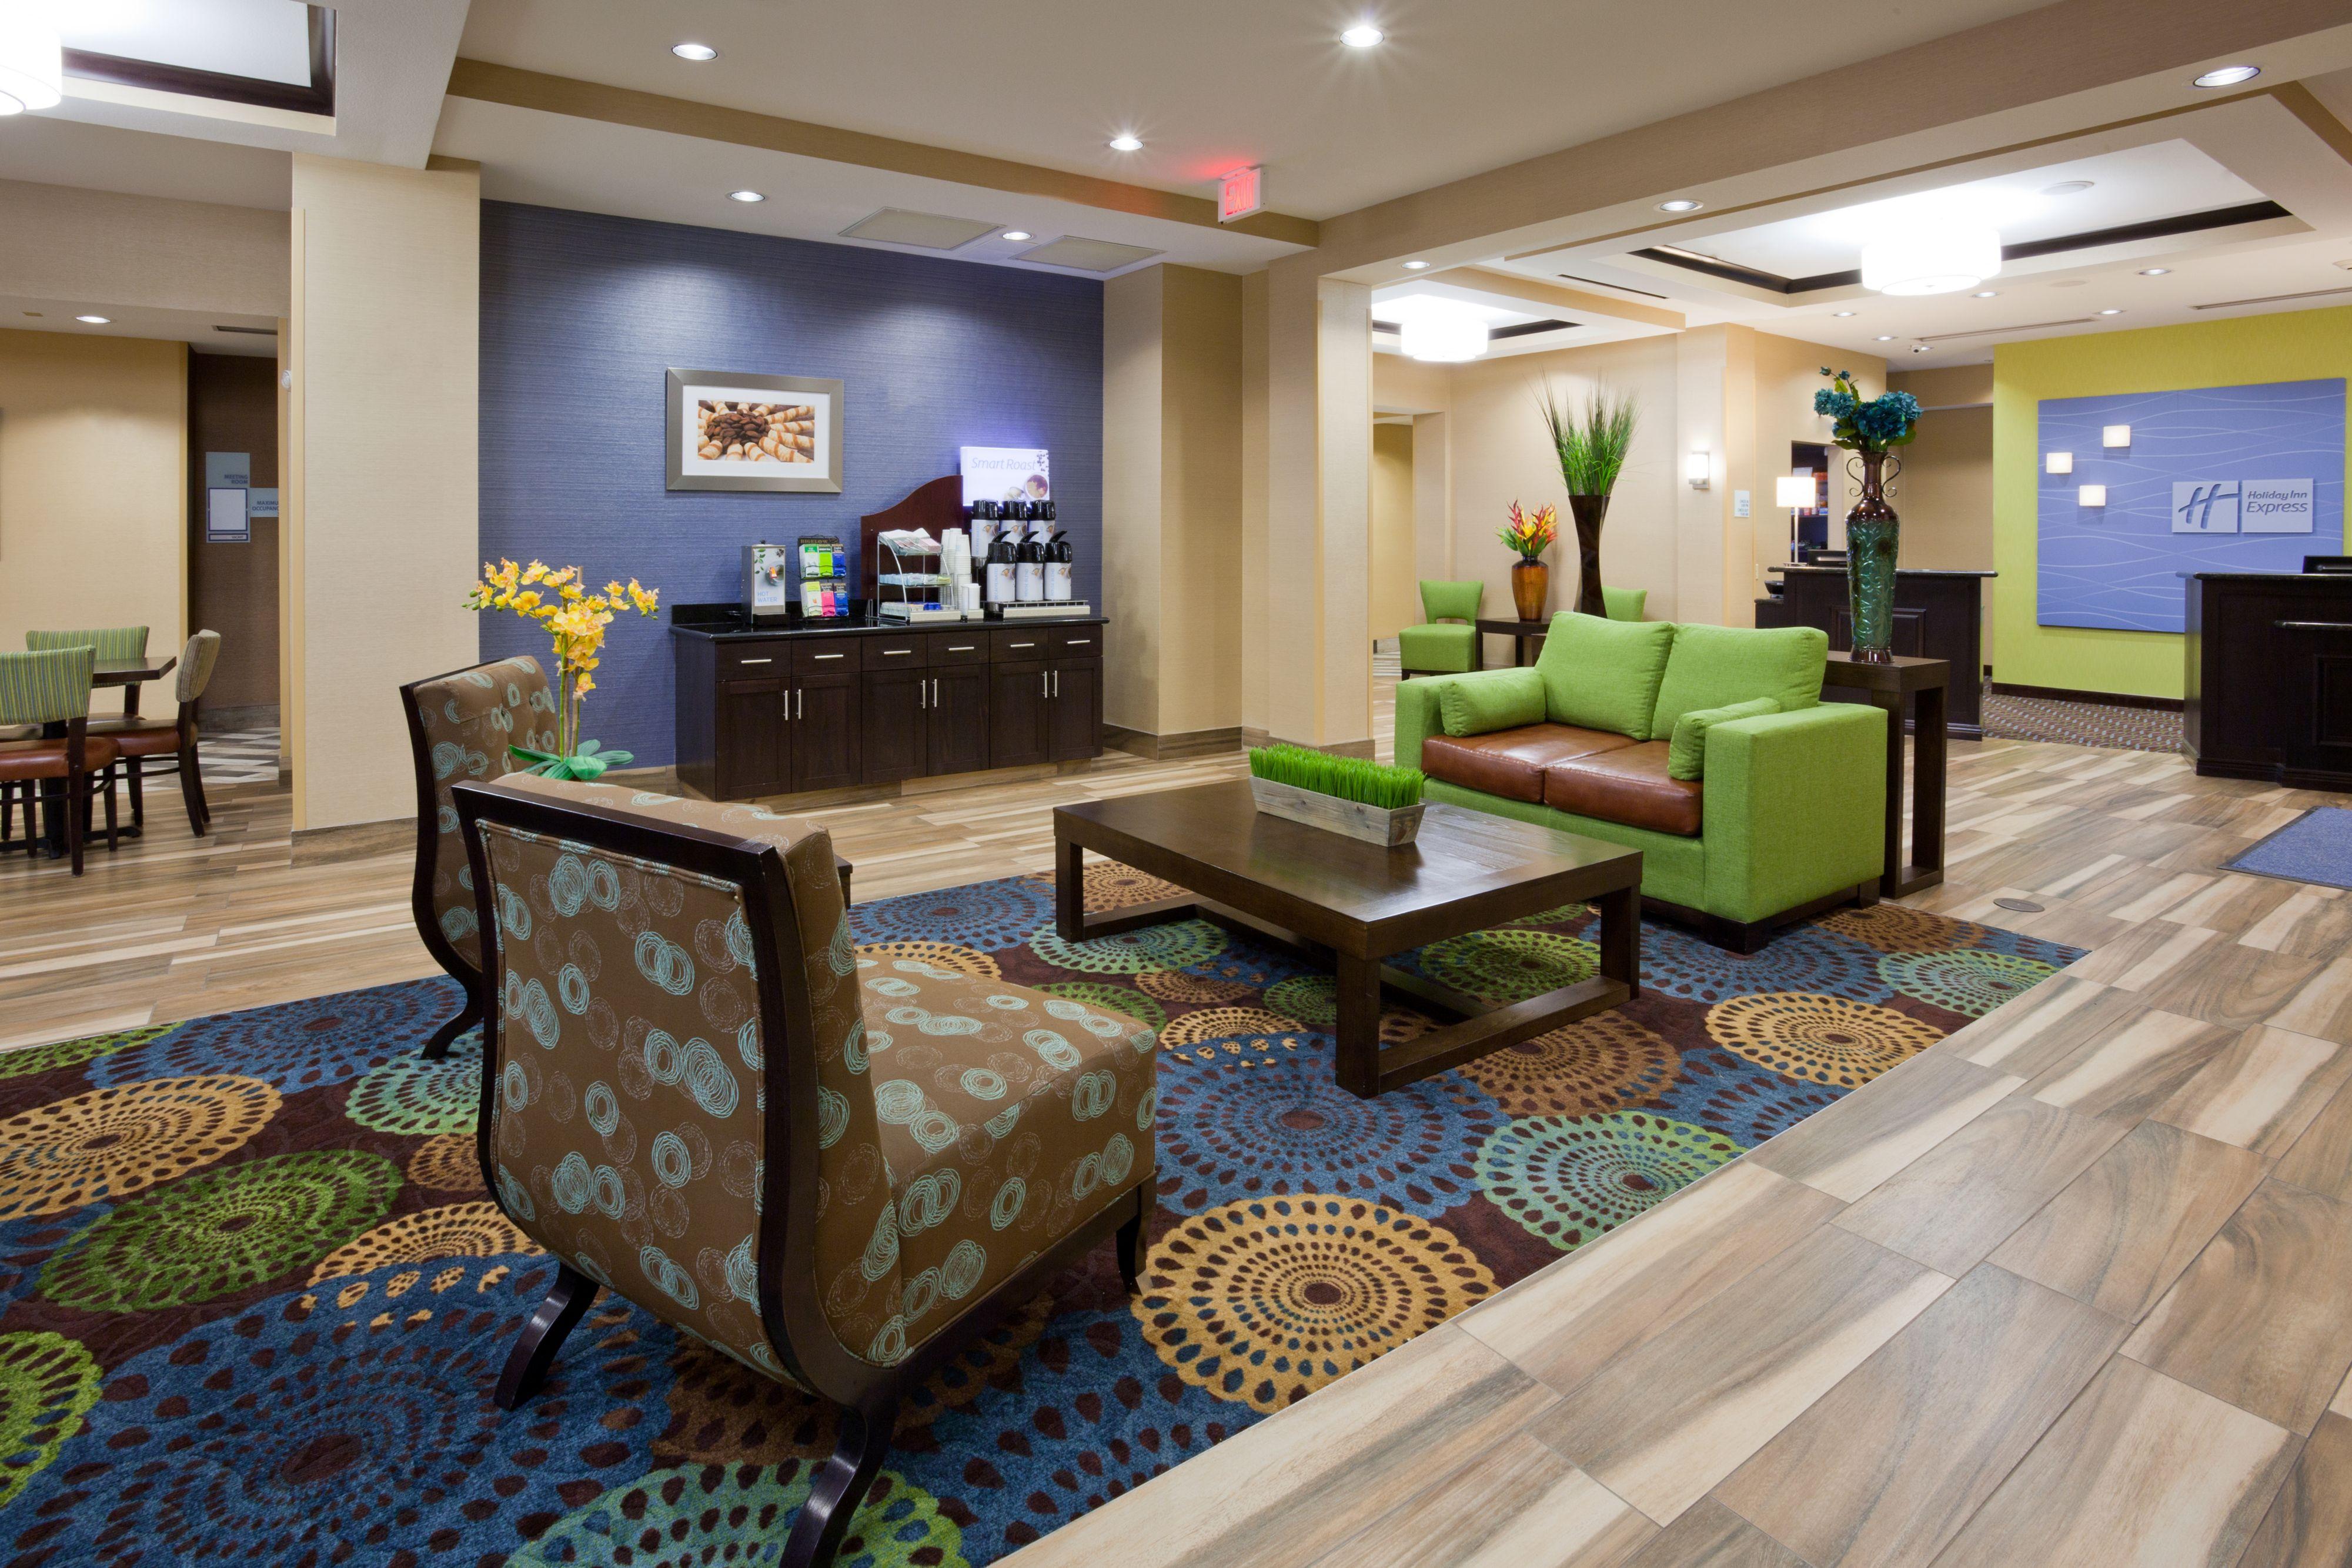 Holiday Inn Express & Suites Fort Dodge image 5